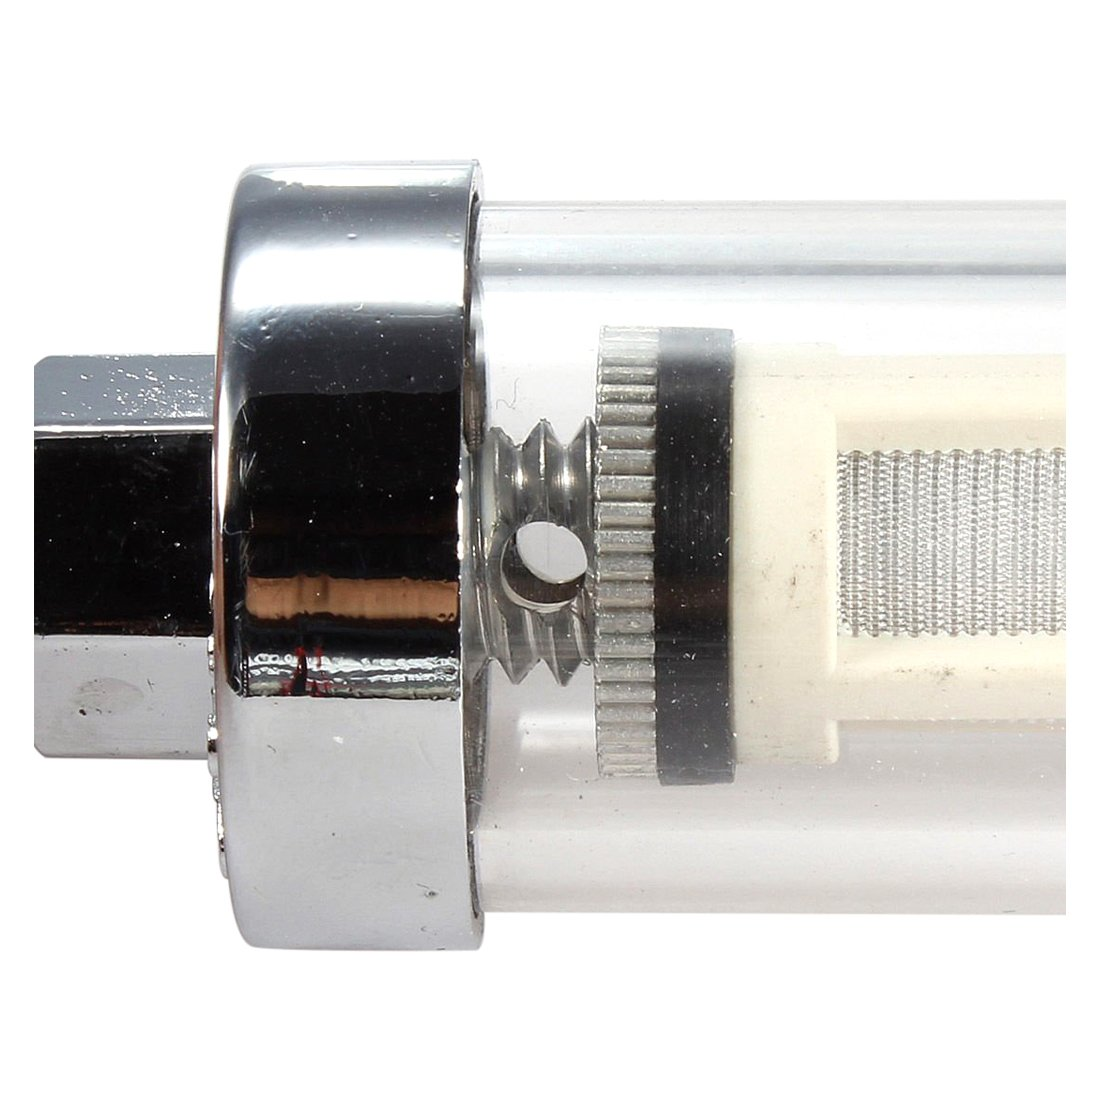 ACAMPTAR Filtro en L/ínea De Motor De Petr/óleo Crudo Gasolina Combustible De Vidrio De Cromo Universal 5//16 Pulgada 8Mm Plata